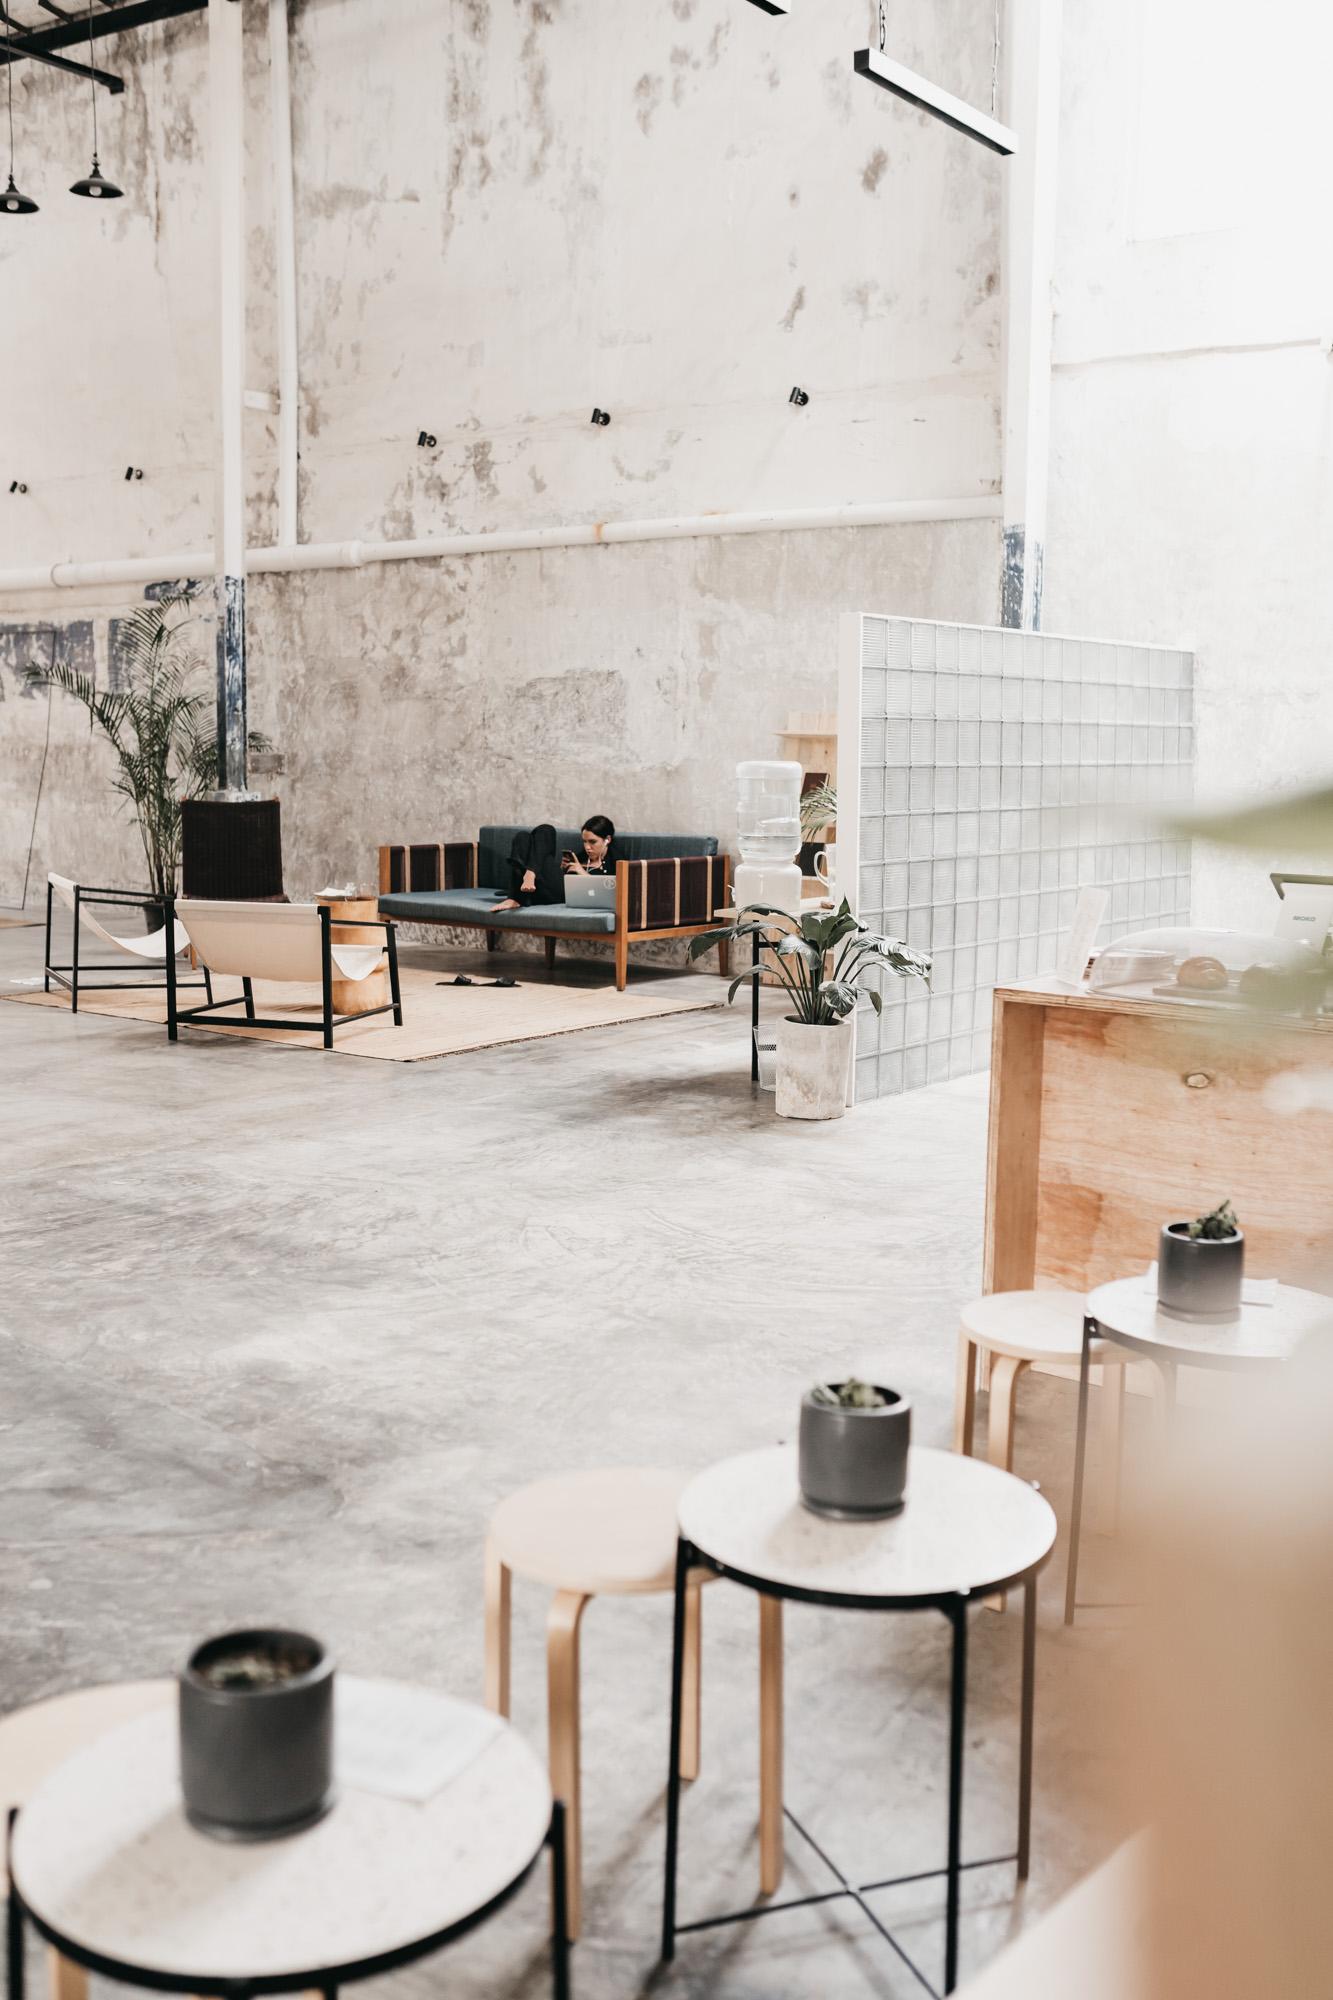 keira-mason-kinship-studio-communal-area.jpg